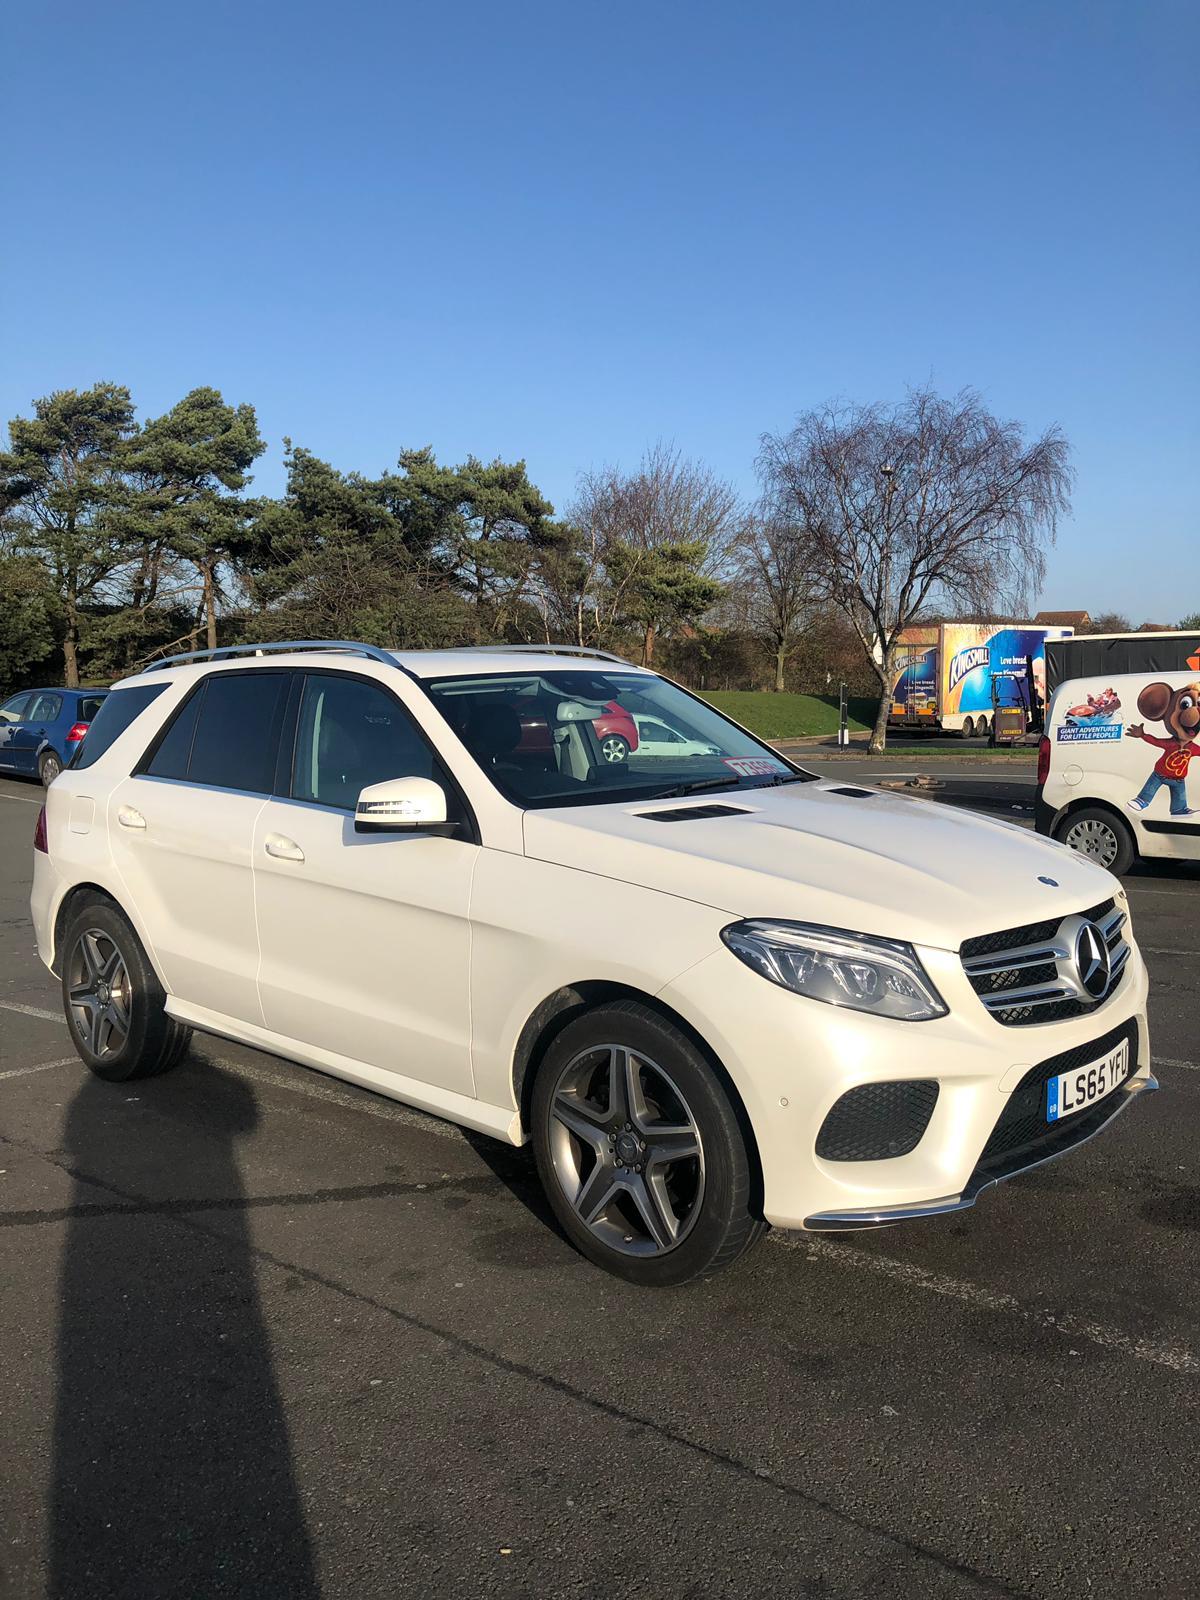 Mercedes Benz GLE 250D – 4Matic AMG Line